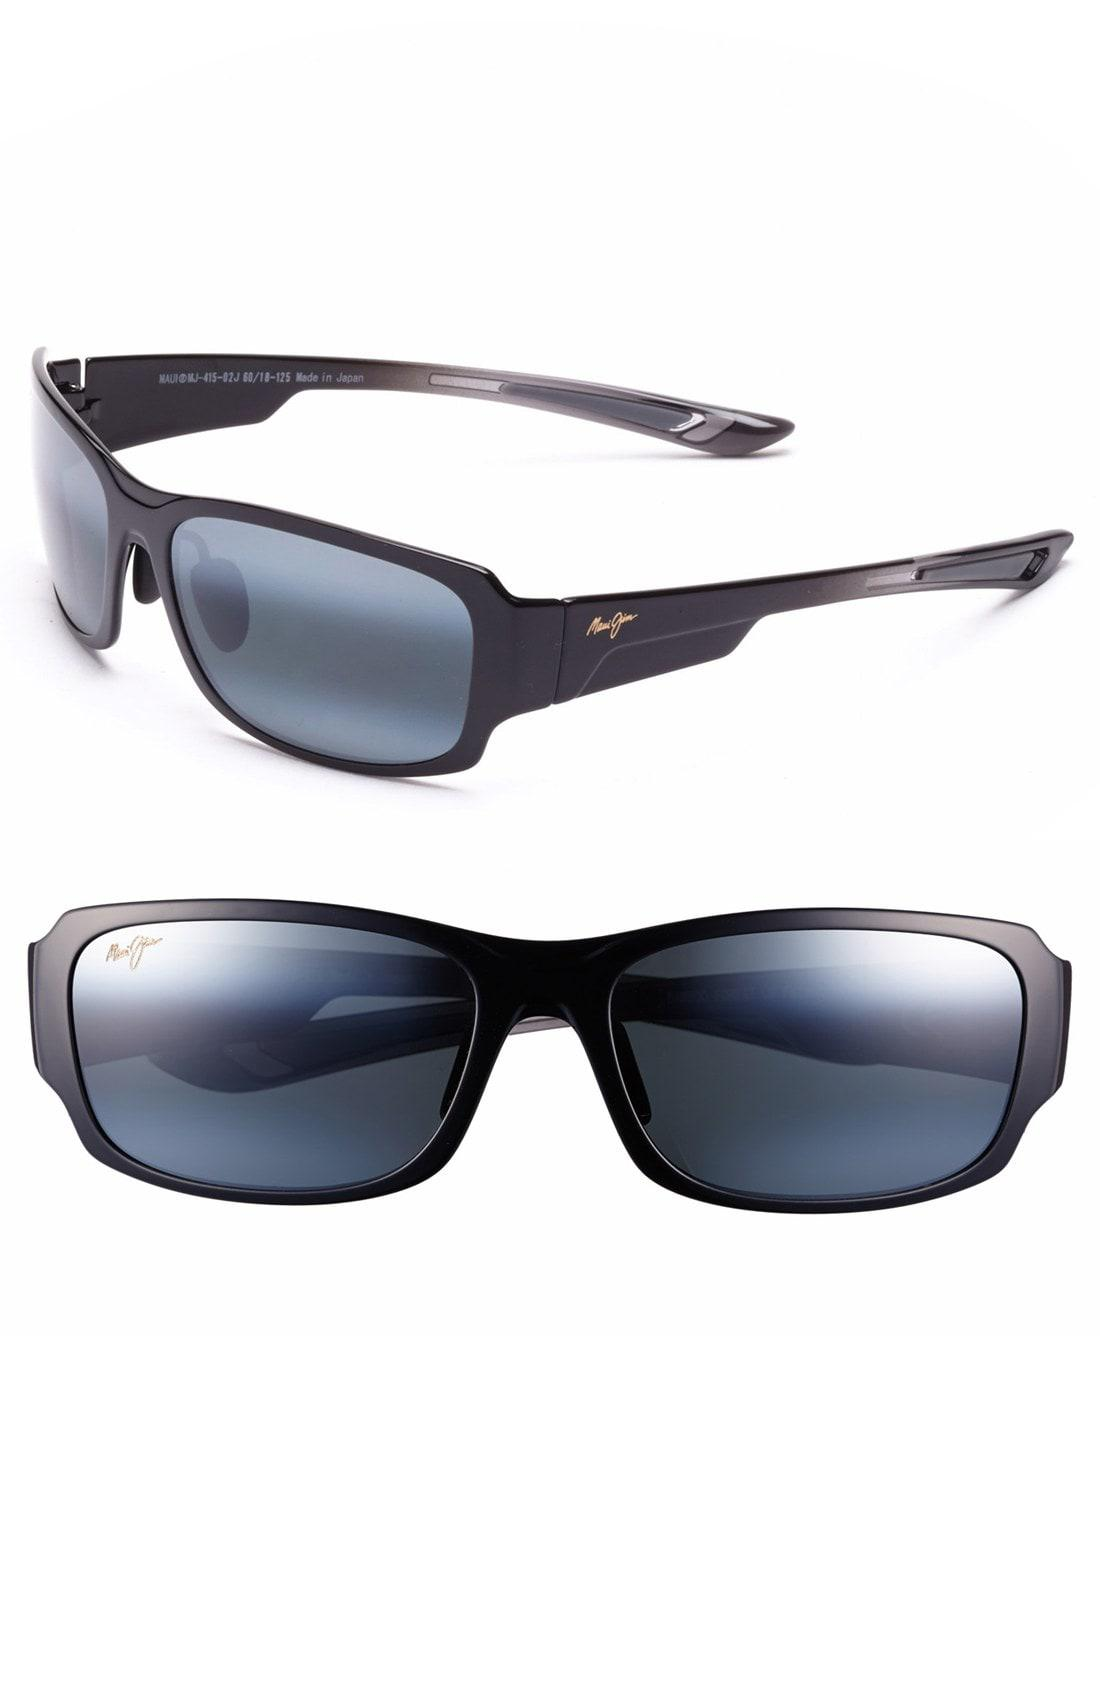 37f4bbd90e Maui Jim. Men s  forest - Polarizedplus2  60mm Sunglasses - Metallic Gloss  Copper